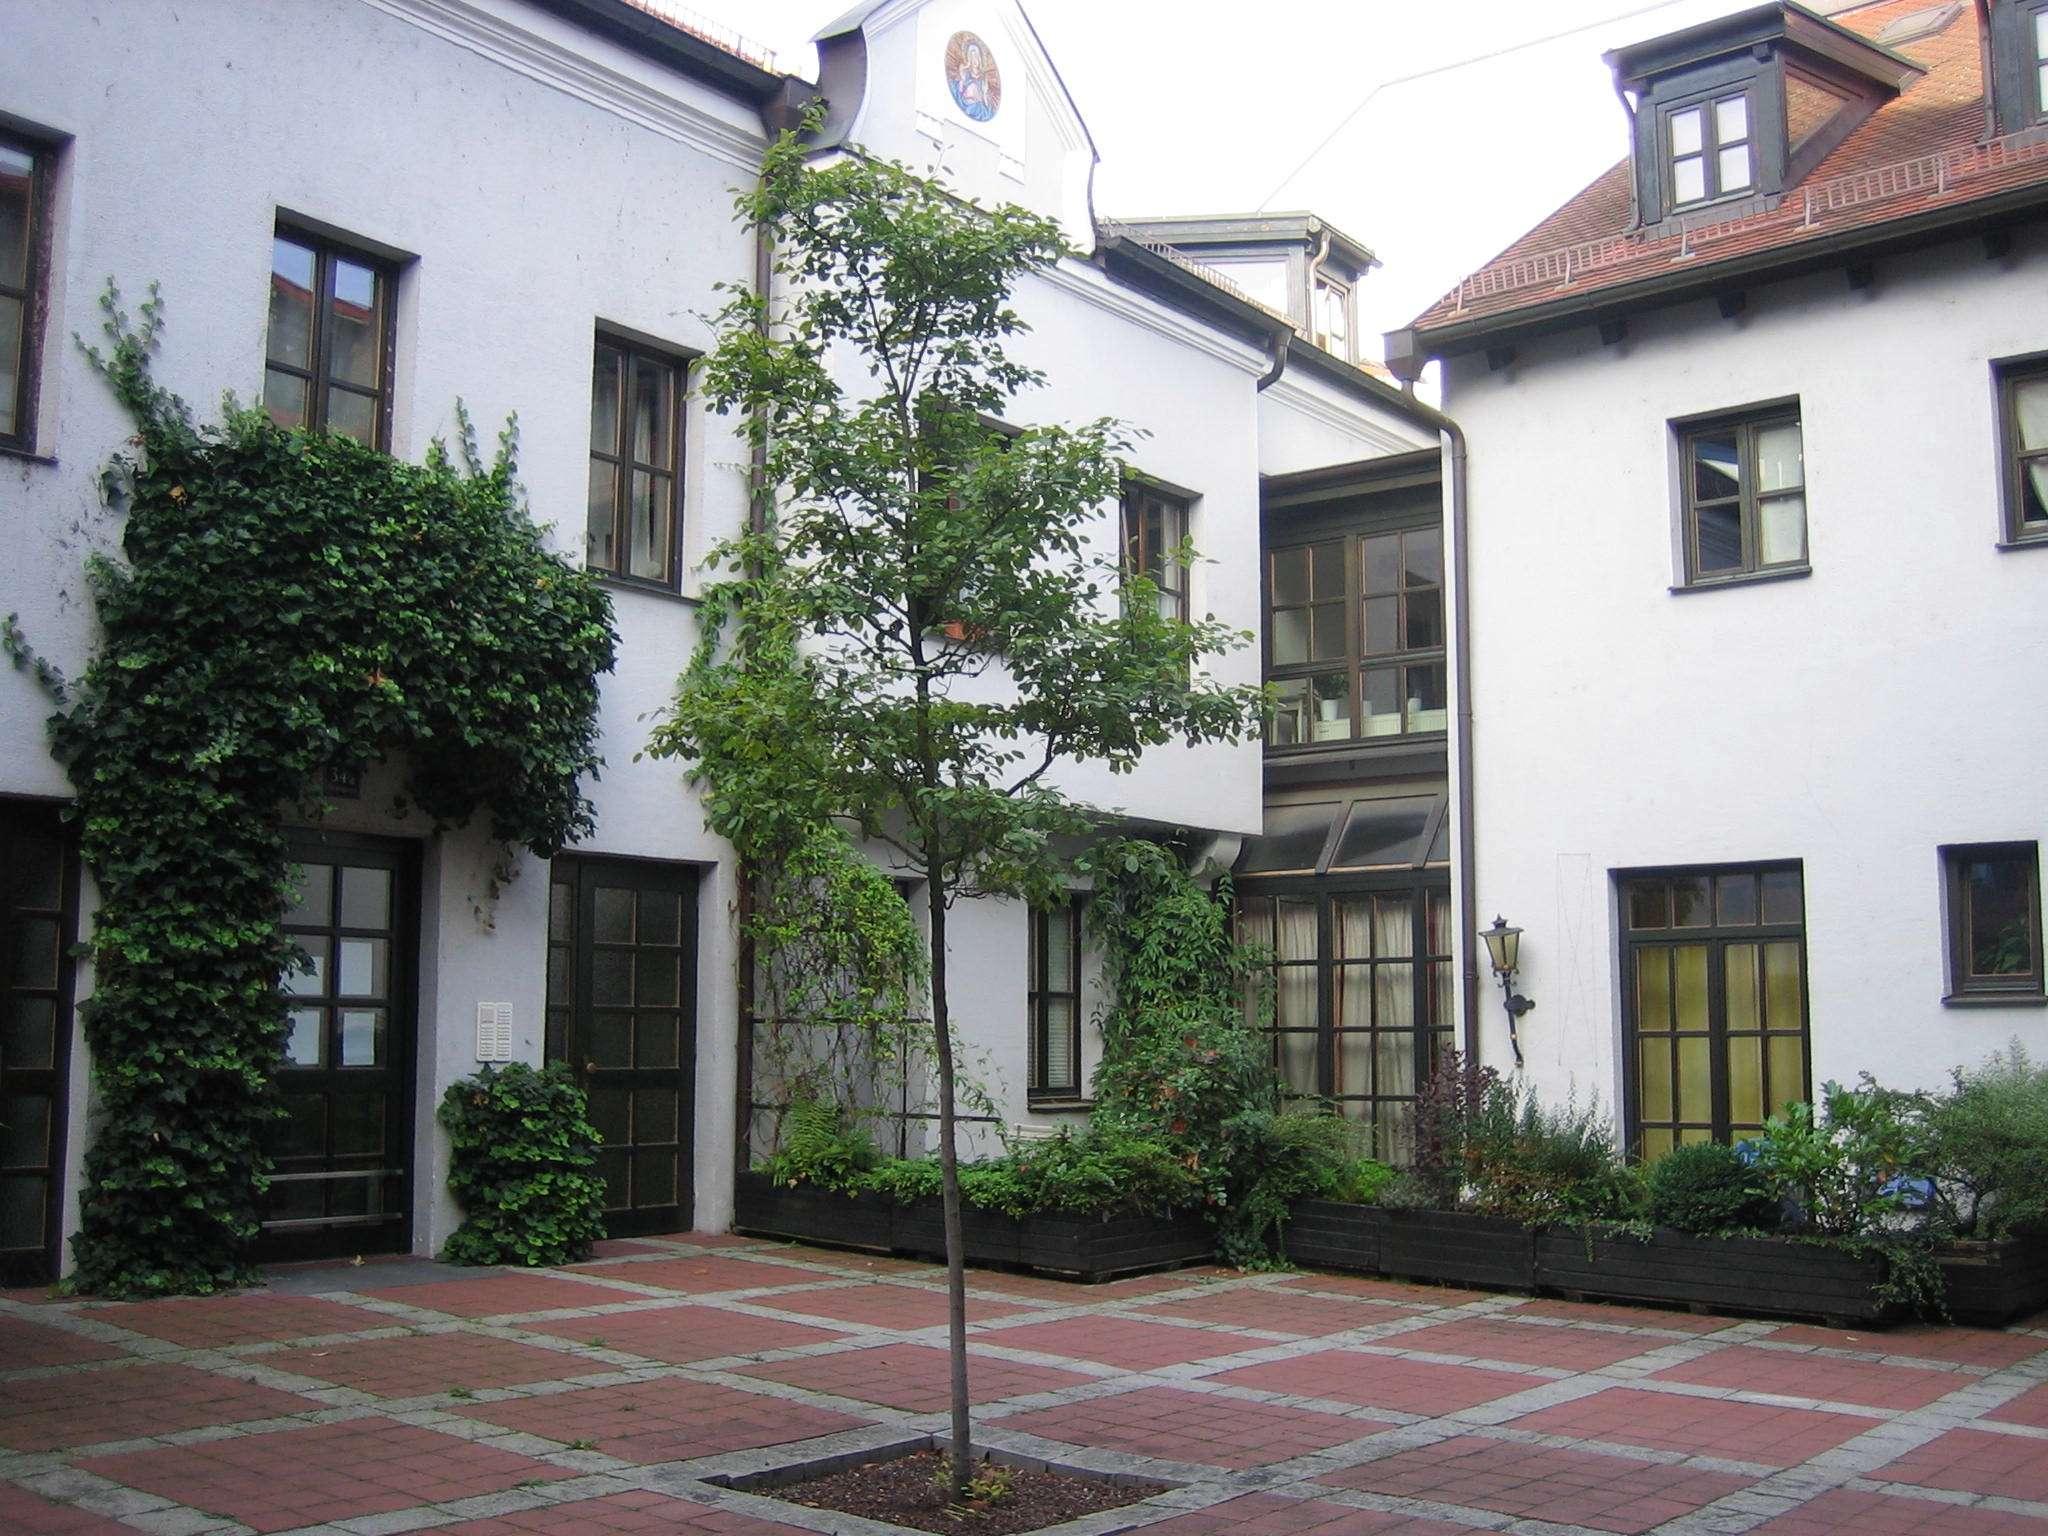 Denkmalgeschützte Galeriewohnung in der Altstadt mit Domblick in Regensburg-Innenstadt